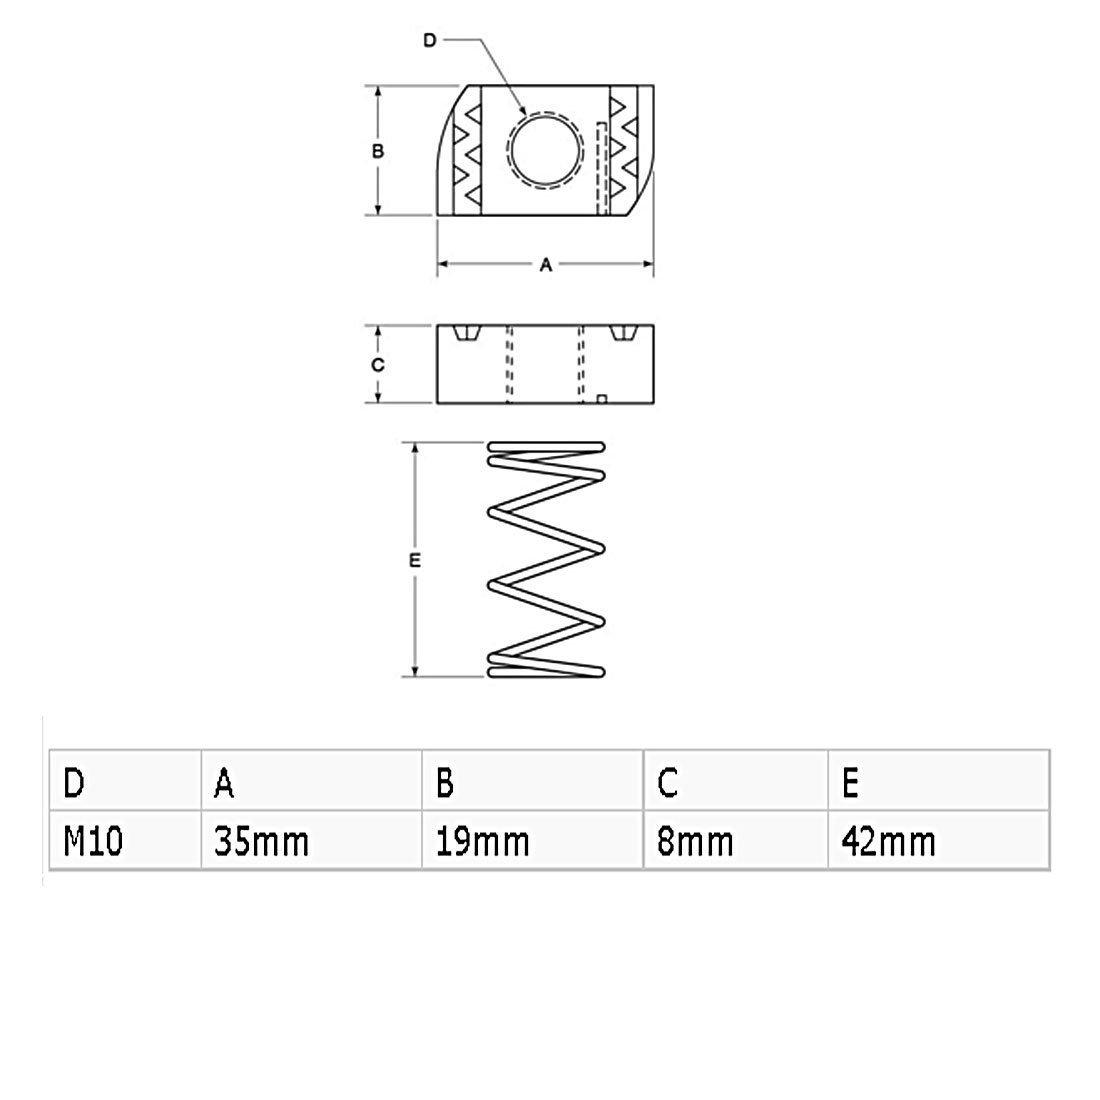 eDealMax a16041100ux1633 Noci Canale M10 x 8mm zincato Strut Lunga Primavera Canale Noci 10 pezzi per i canali B-Line